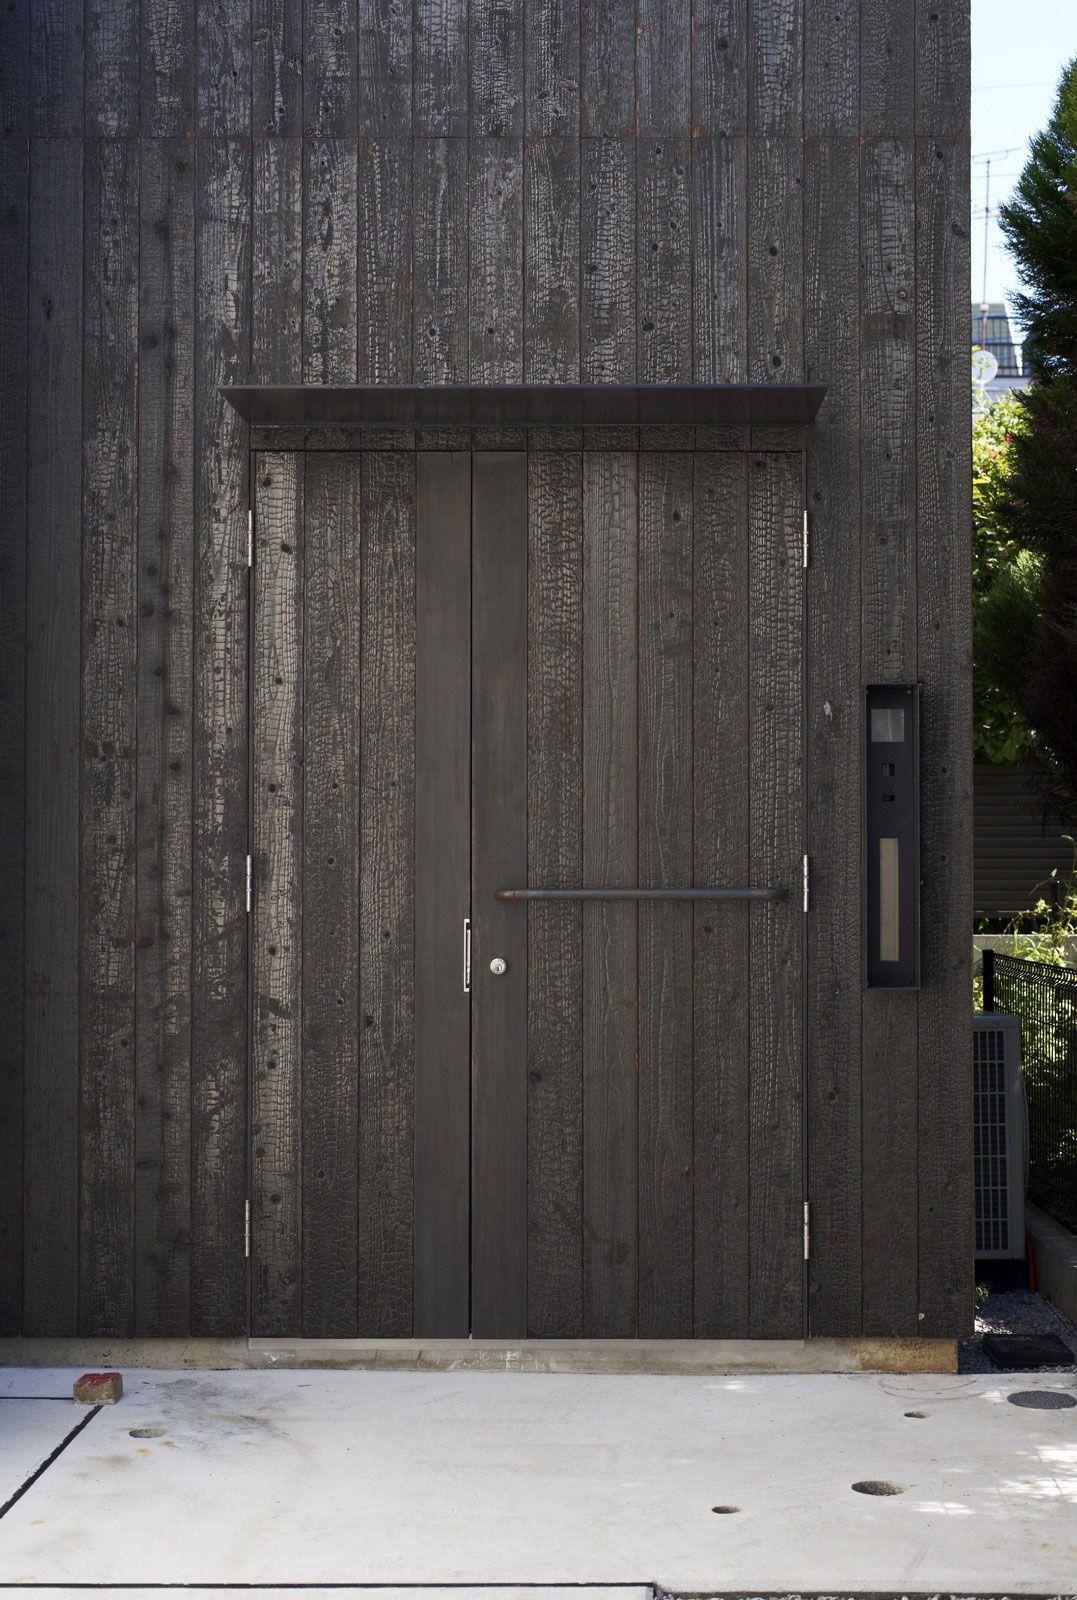 Futakoshinchi House Featuring Shou Sugi Ban Or Burnt Wood Siding